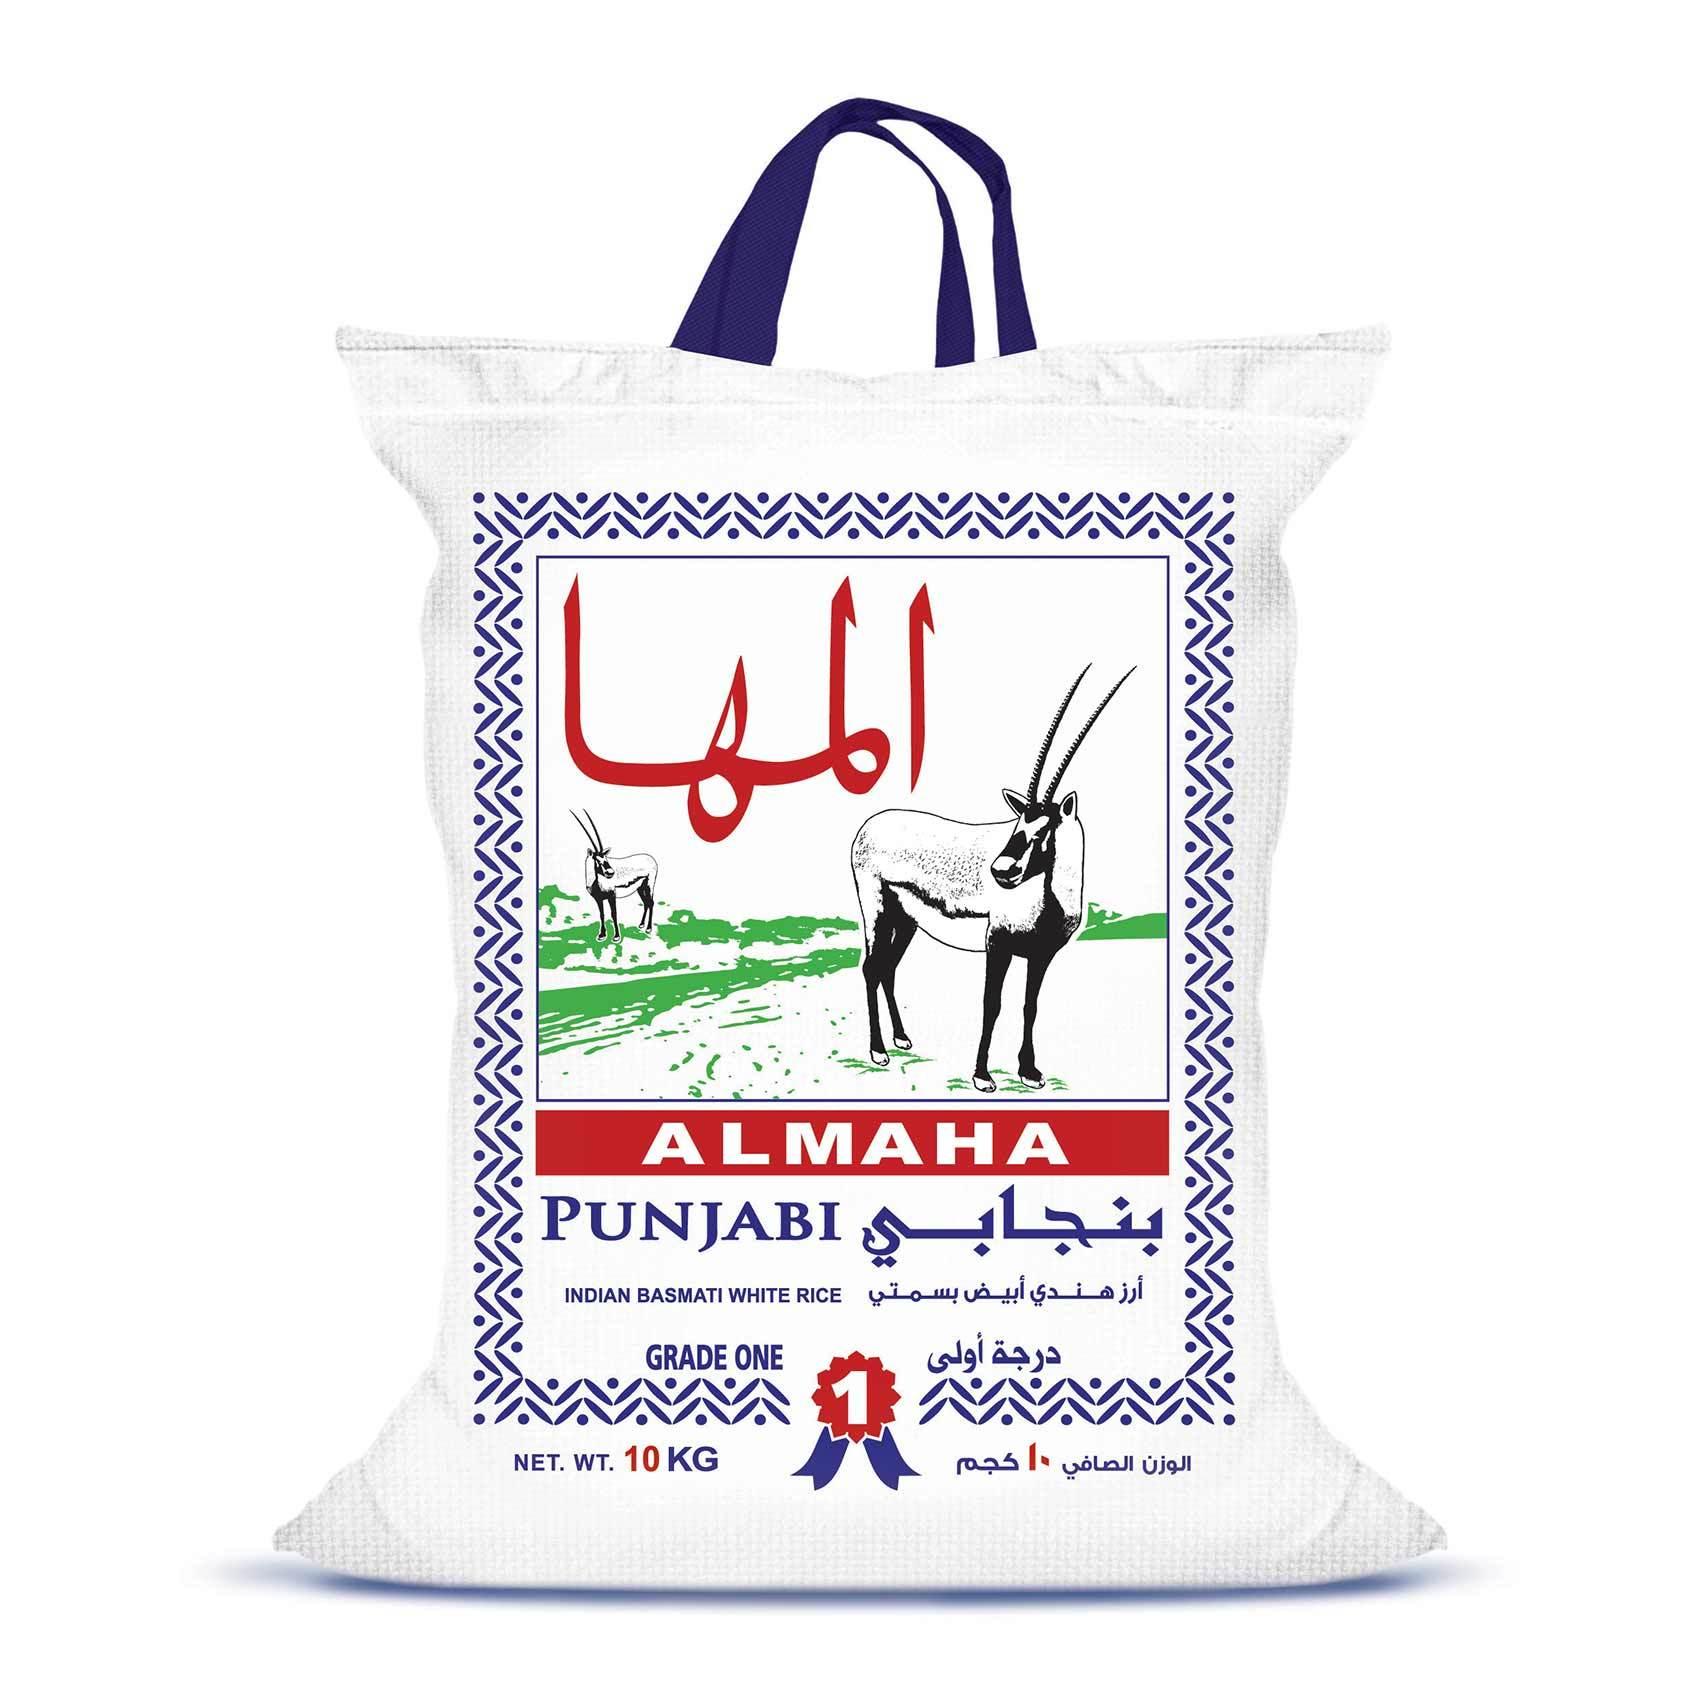 Buy Almaha Punjabi Indian Basmati White Rice 10 Kg Online Shop Food Cupboard On Carrefour Saudi Arabia